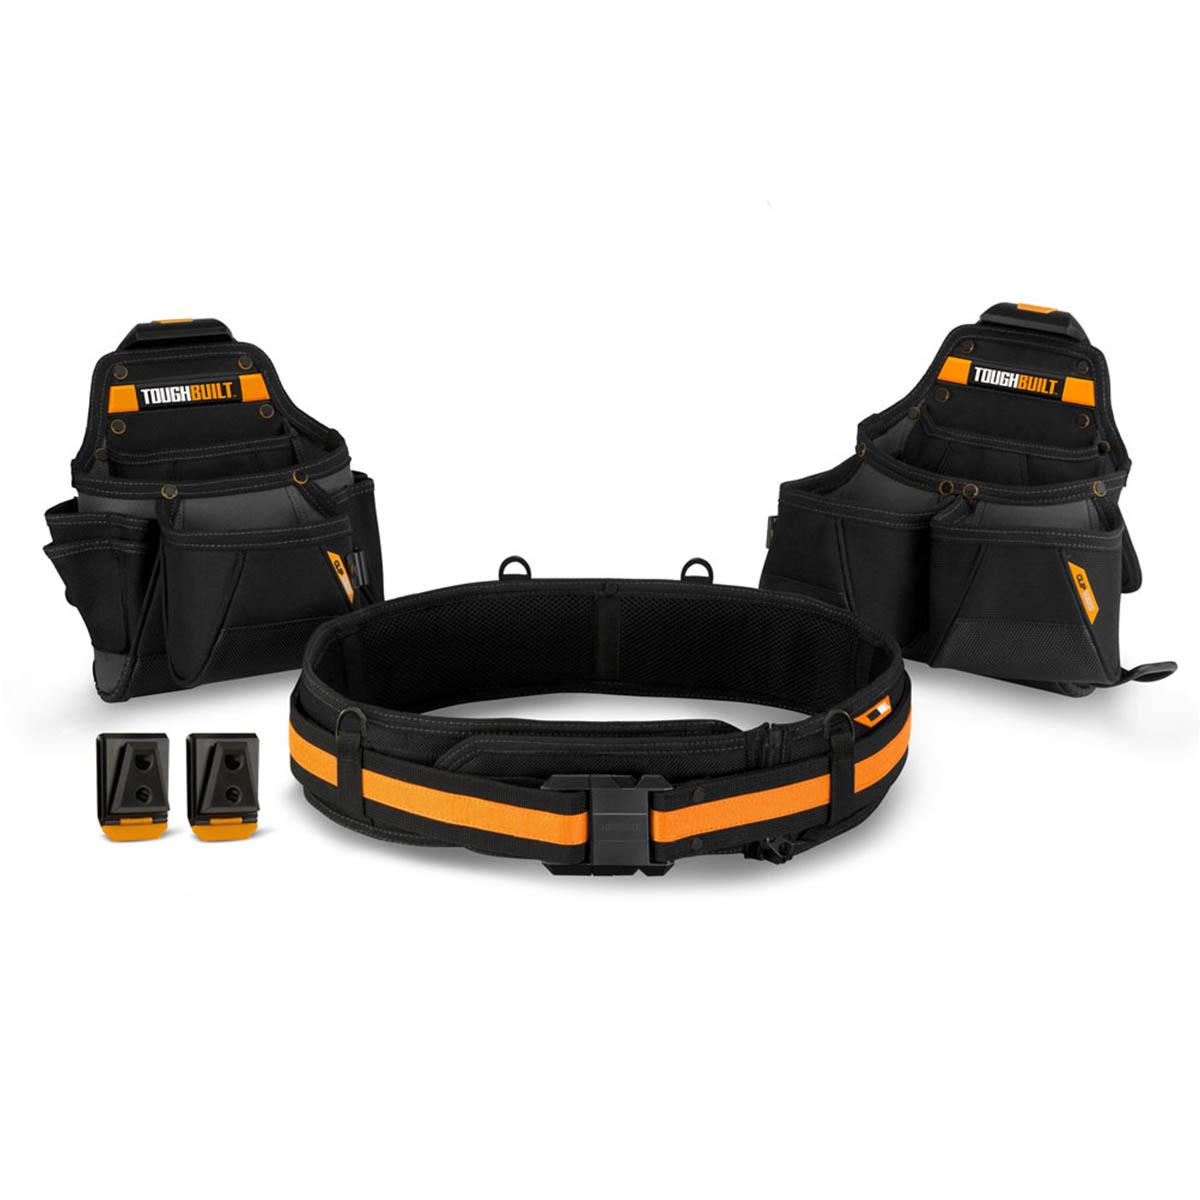 Bolsas Porta Herramientas 27 Bolsillos + Cinturon Toughbuilt